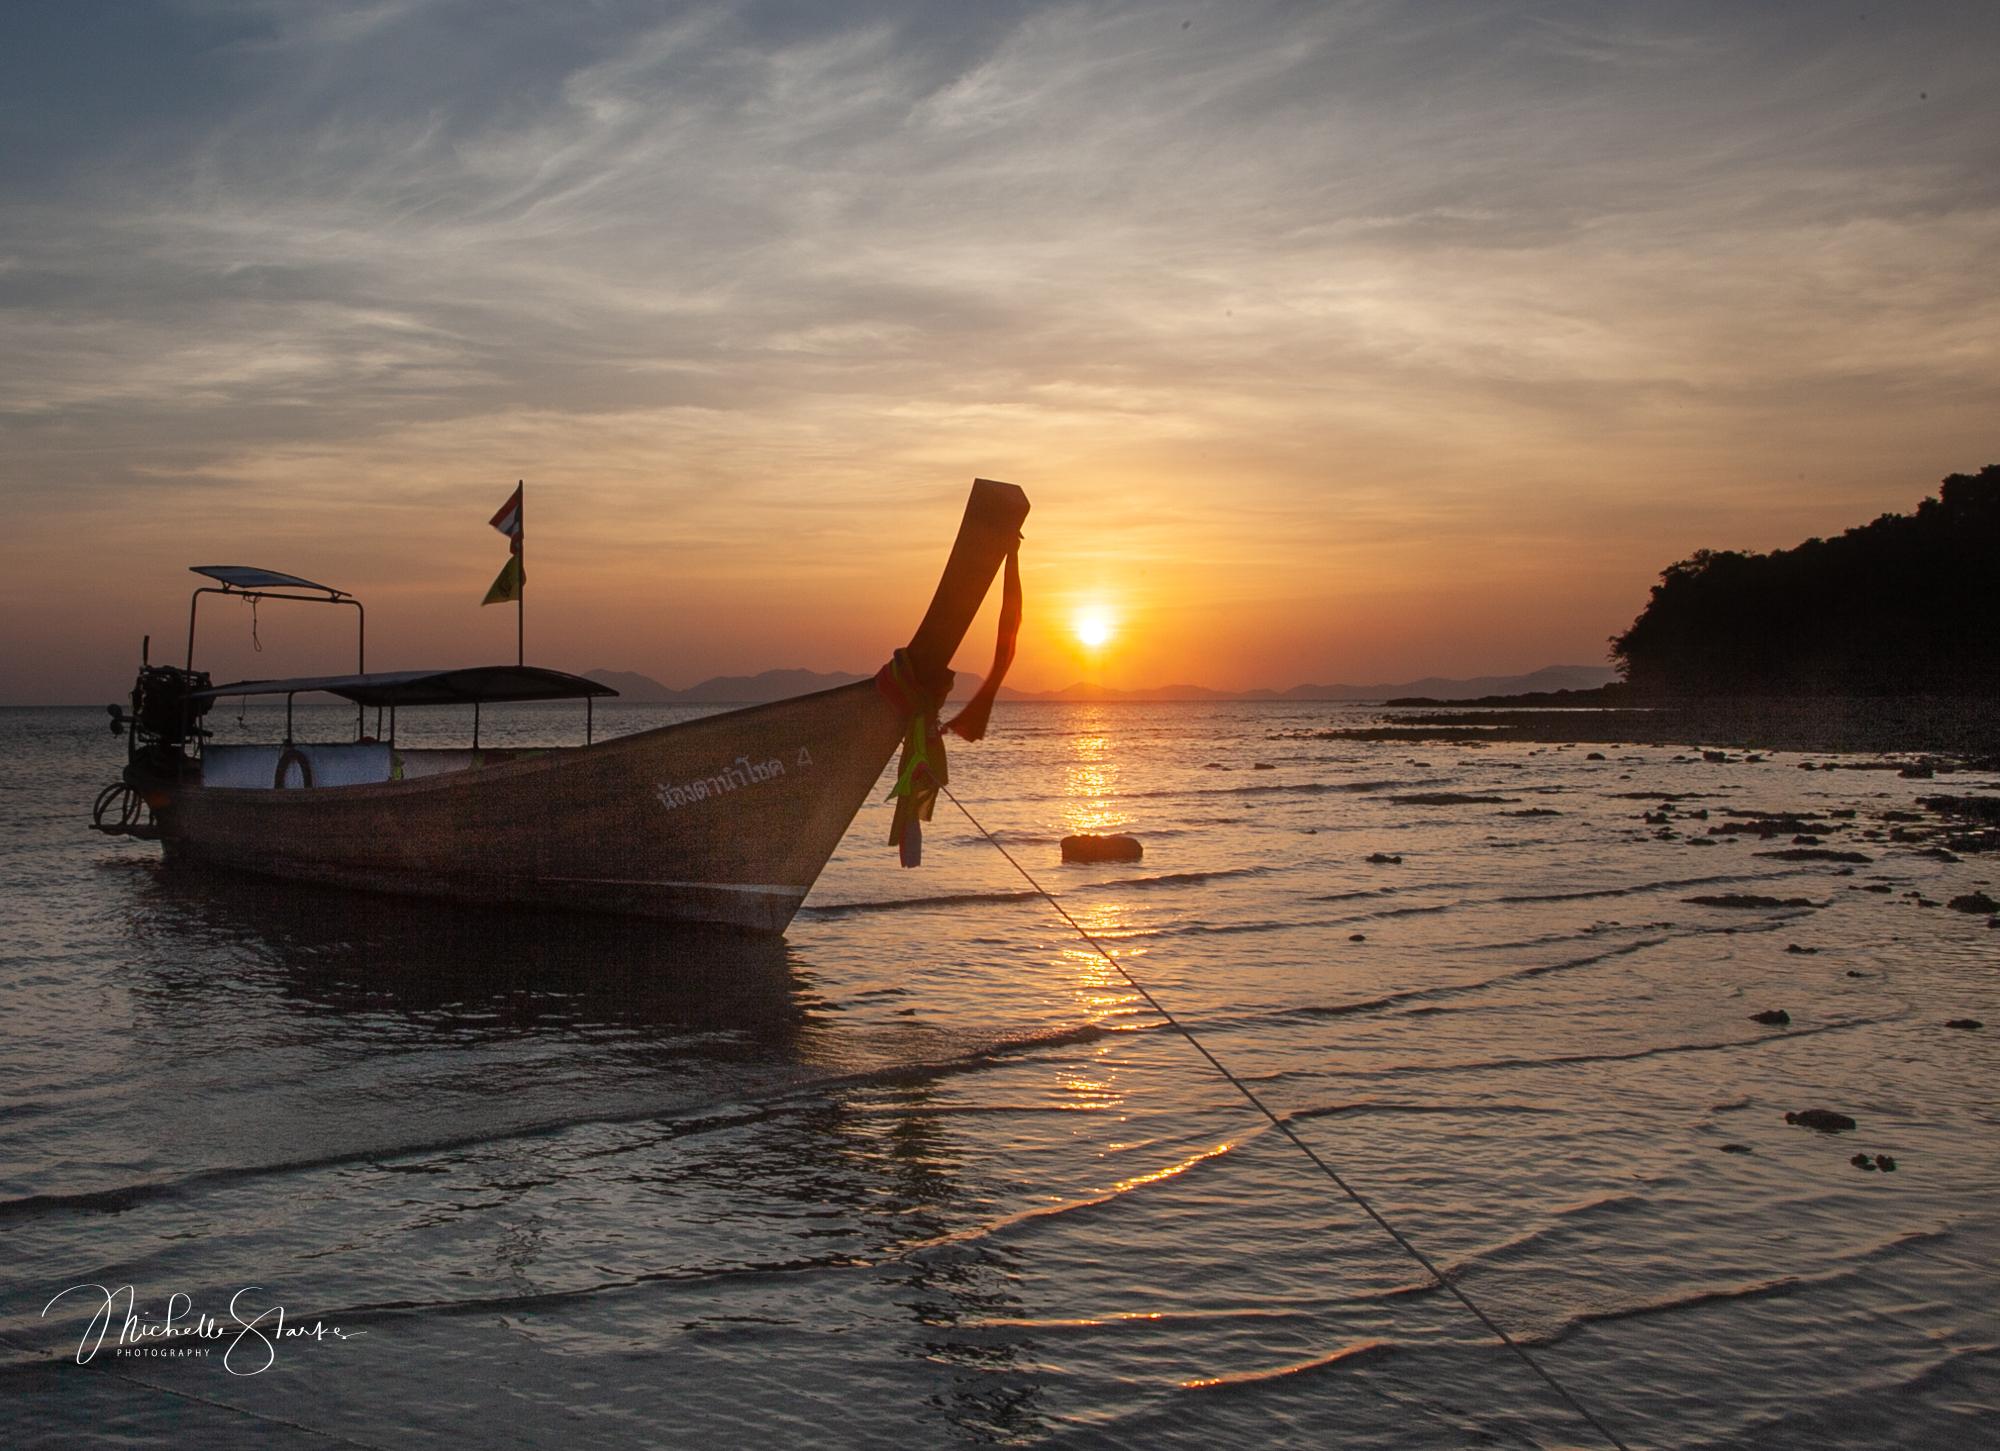 Thai Longboat, Krabi, Thailand